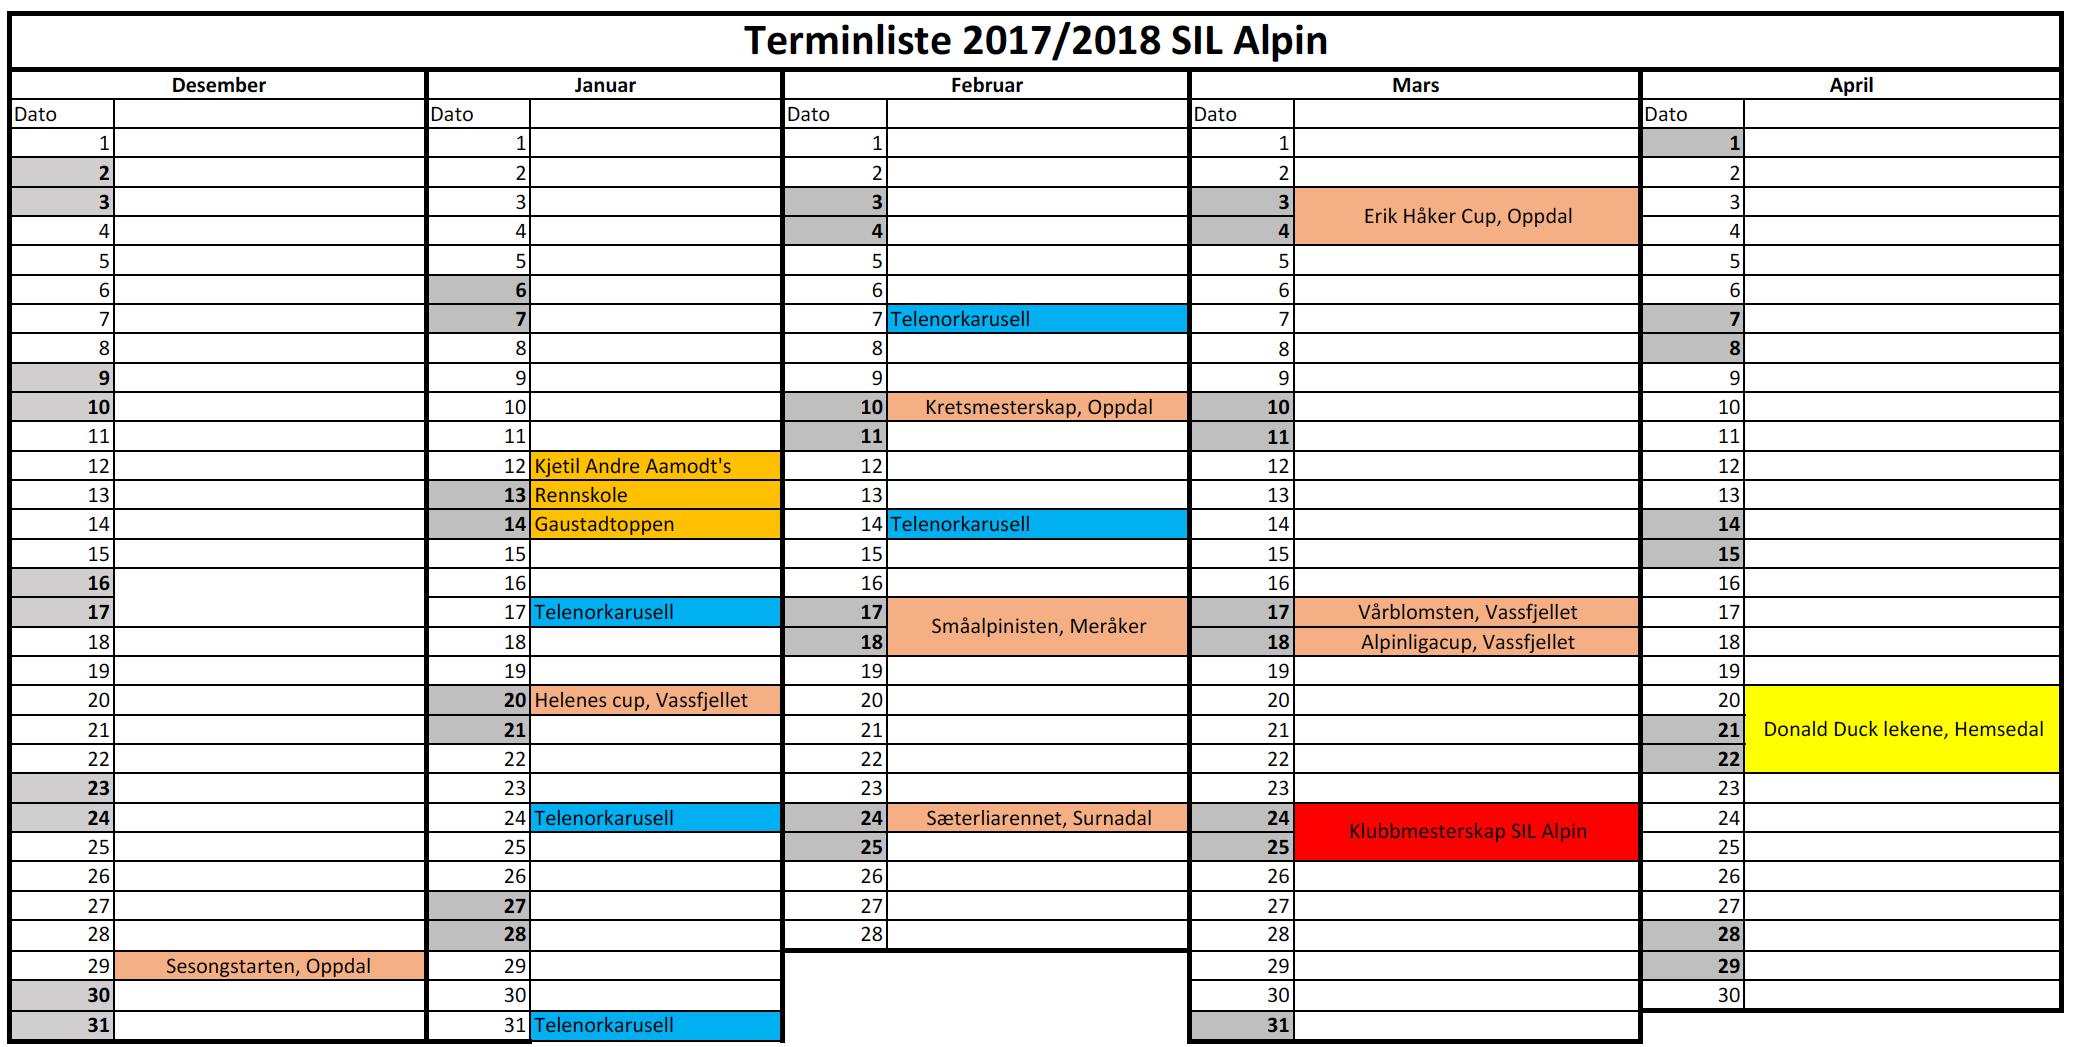 Terminliste Alpin SIL 17/18